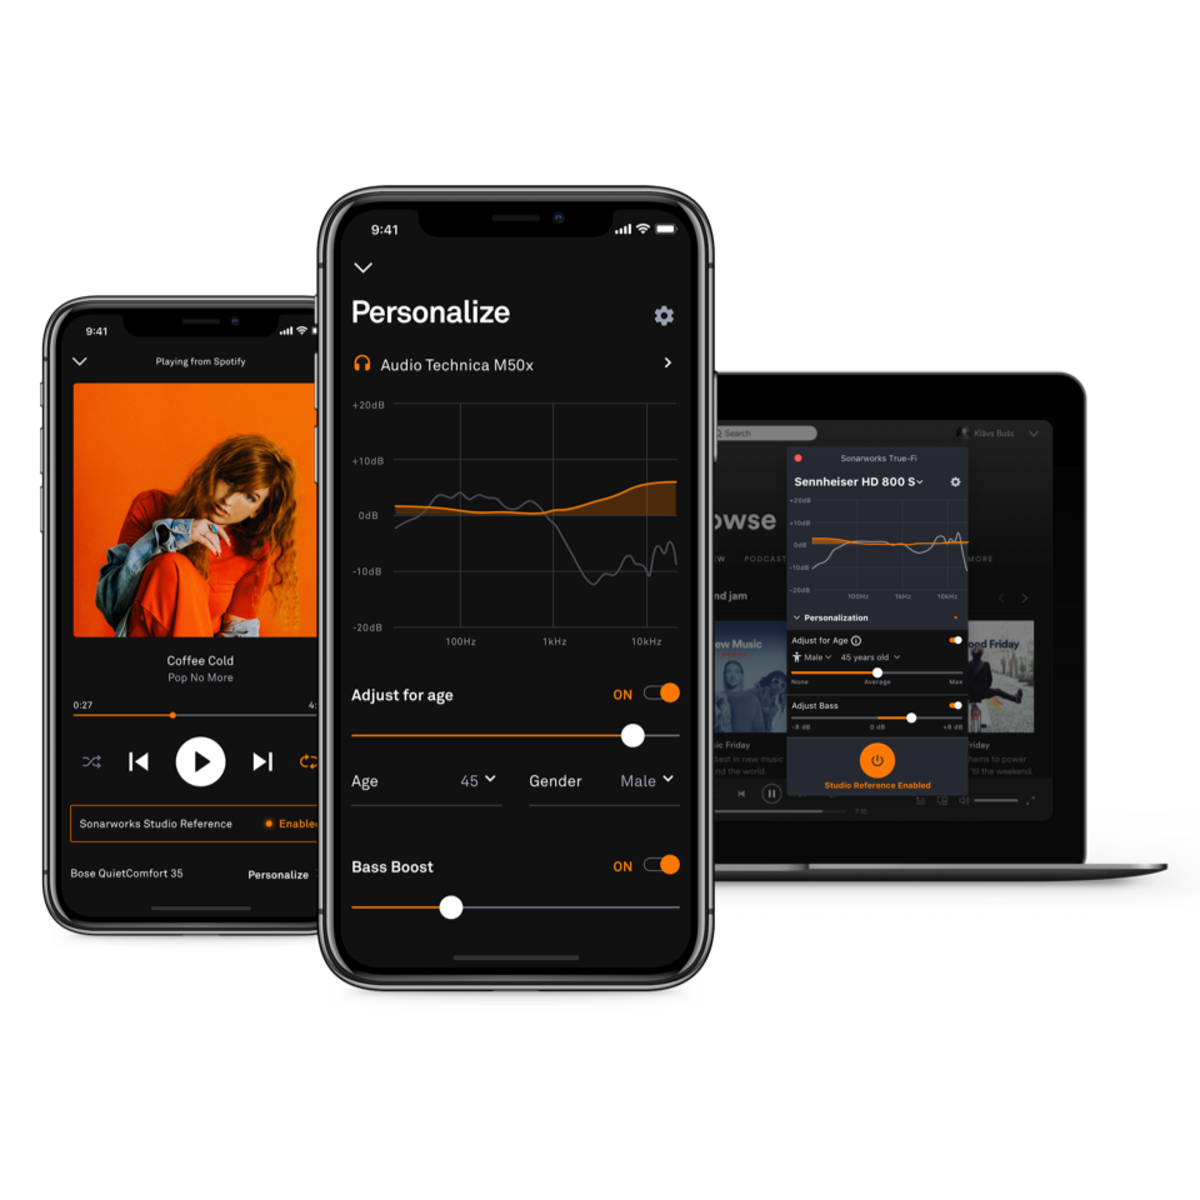 Sonarworks App